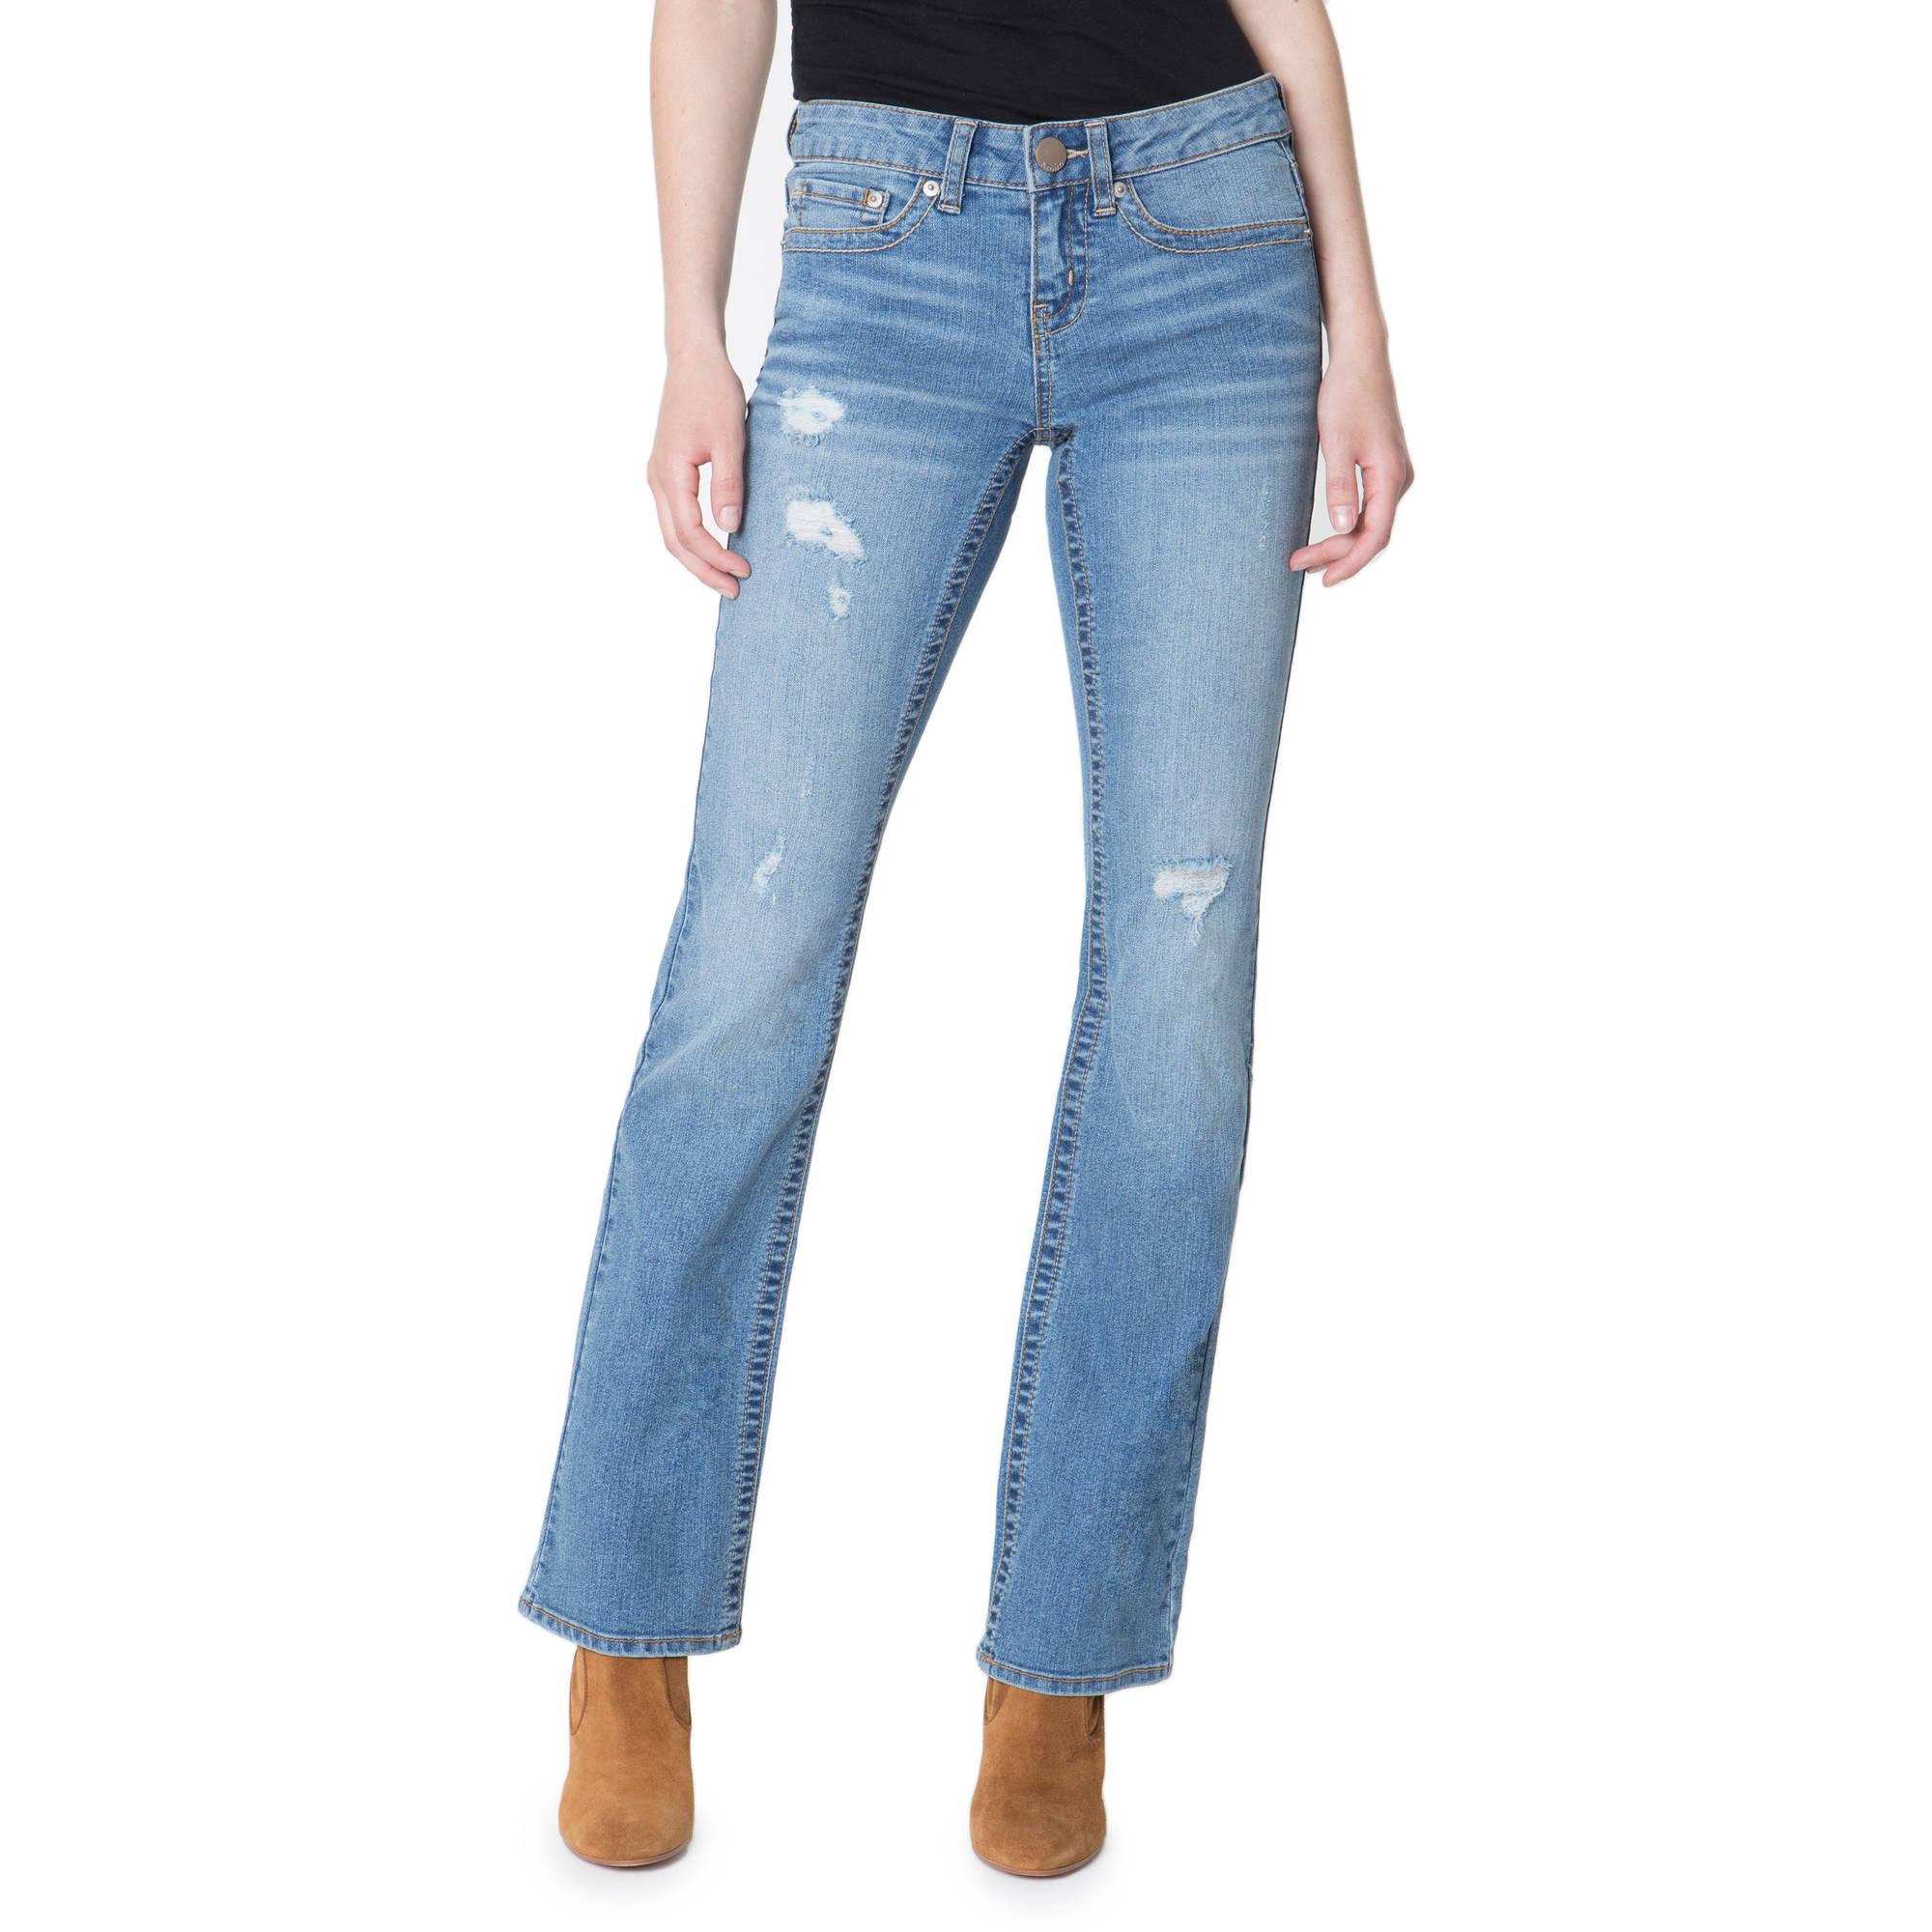 No Boundaries Juniors' Essential Distressed Bootcut Jeans